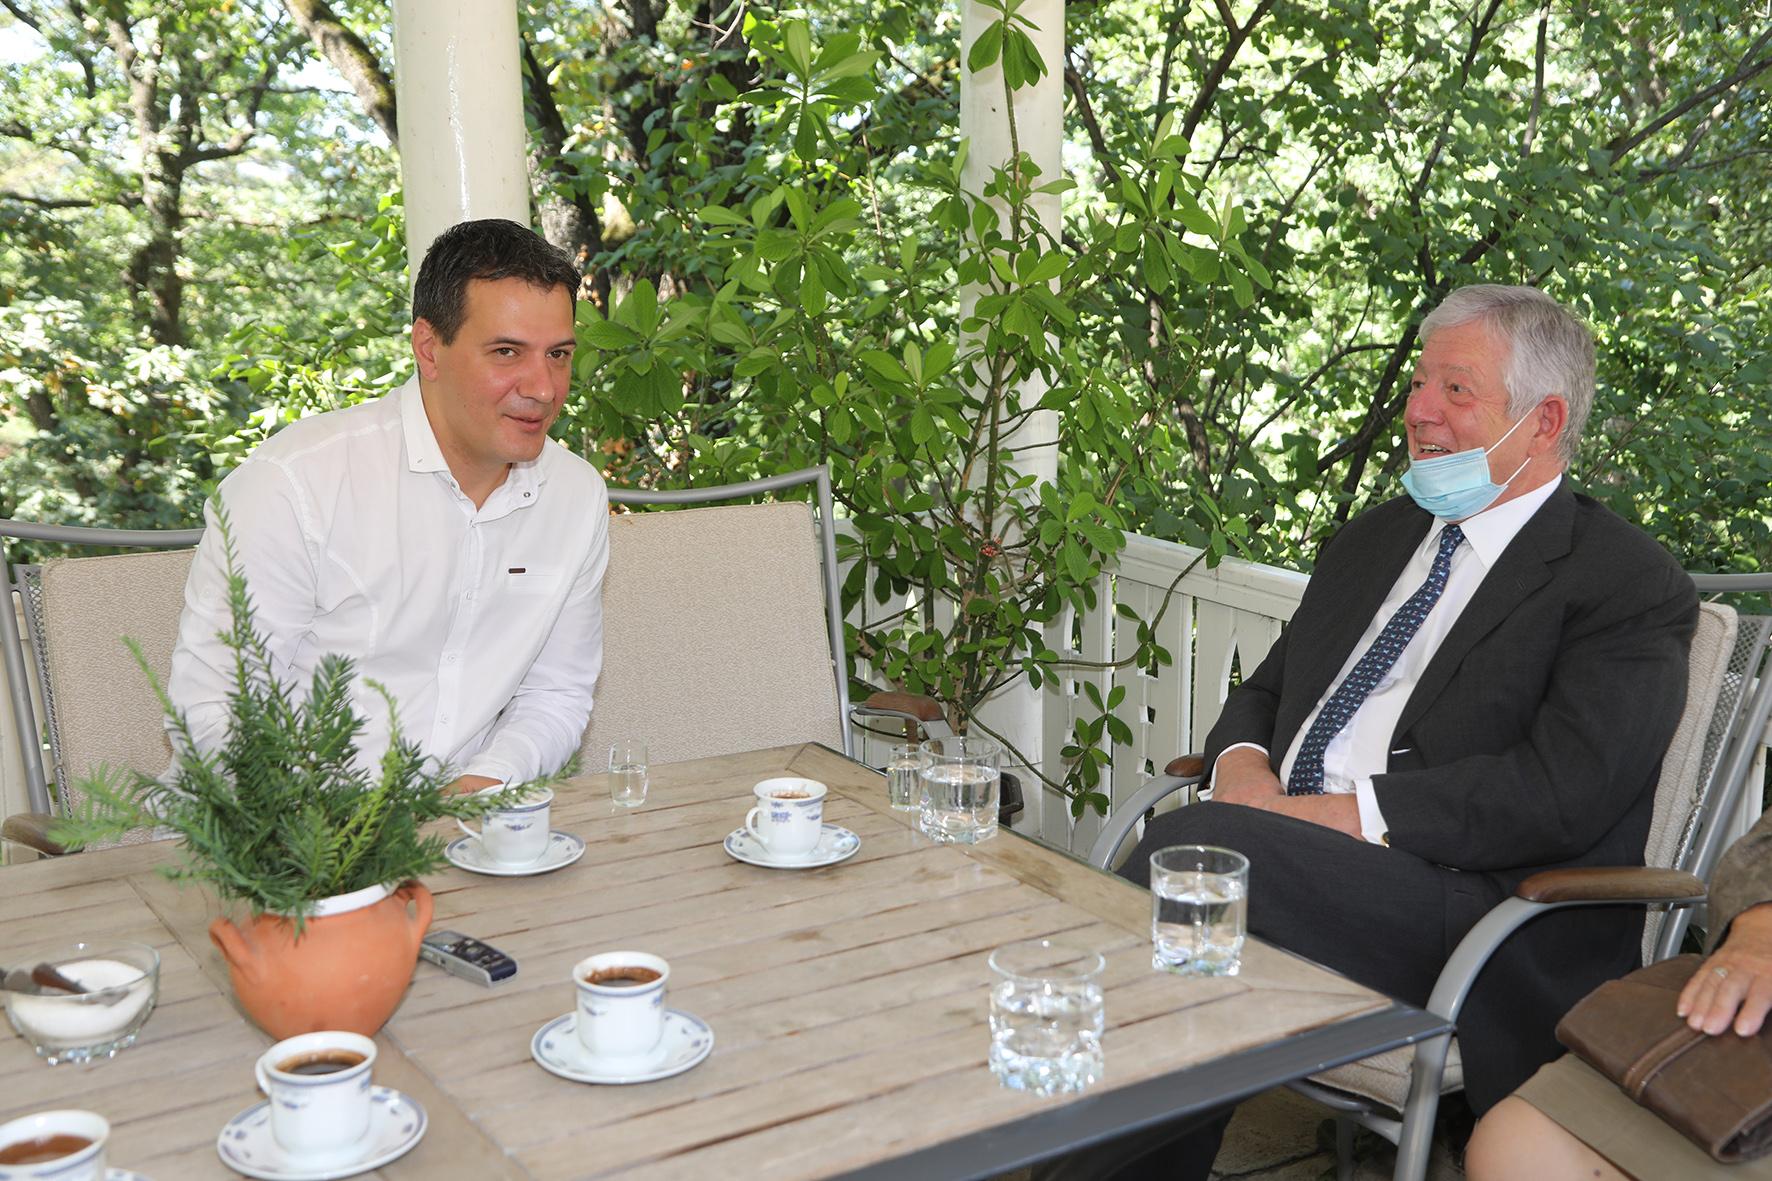 Nj.K.V. Prestolonaslednik Aleksandar sa predsednikom opštine Topola, g-dinom Igorom Petrovićem